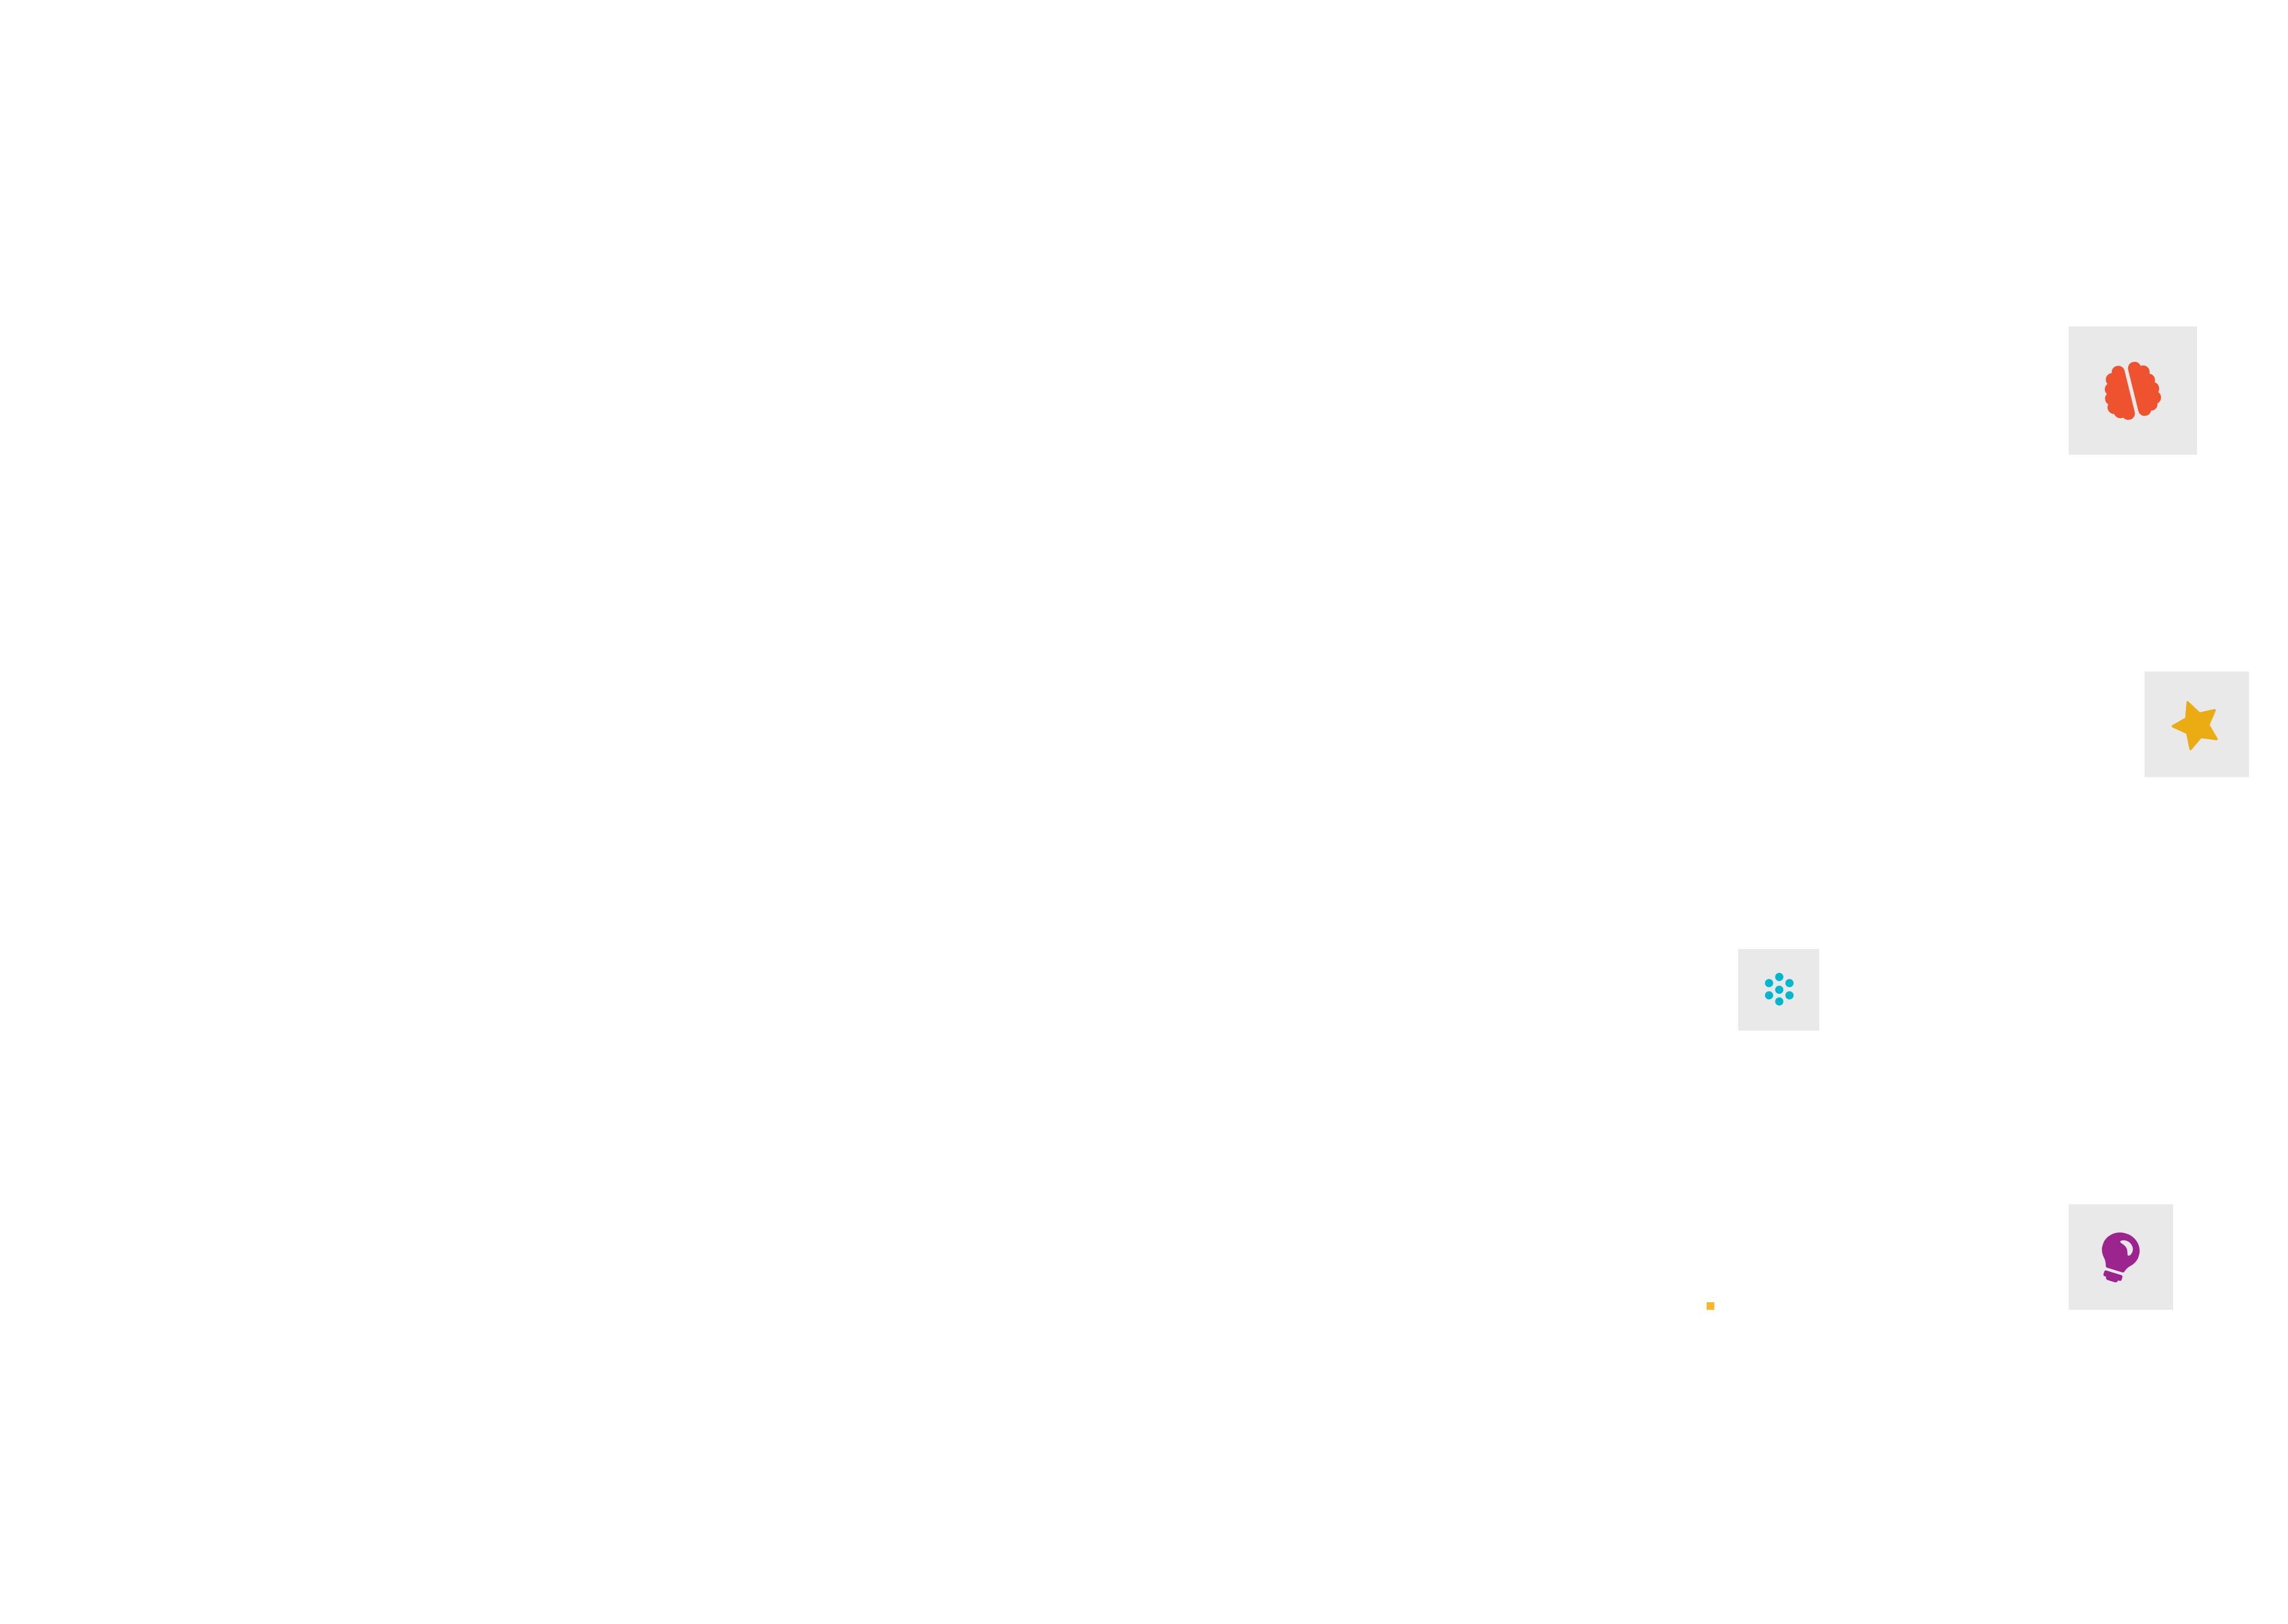 bg-i4-affiliate-circle-icons-3